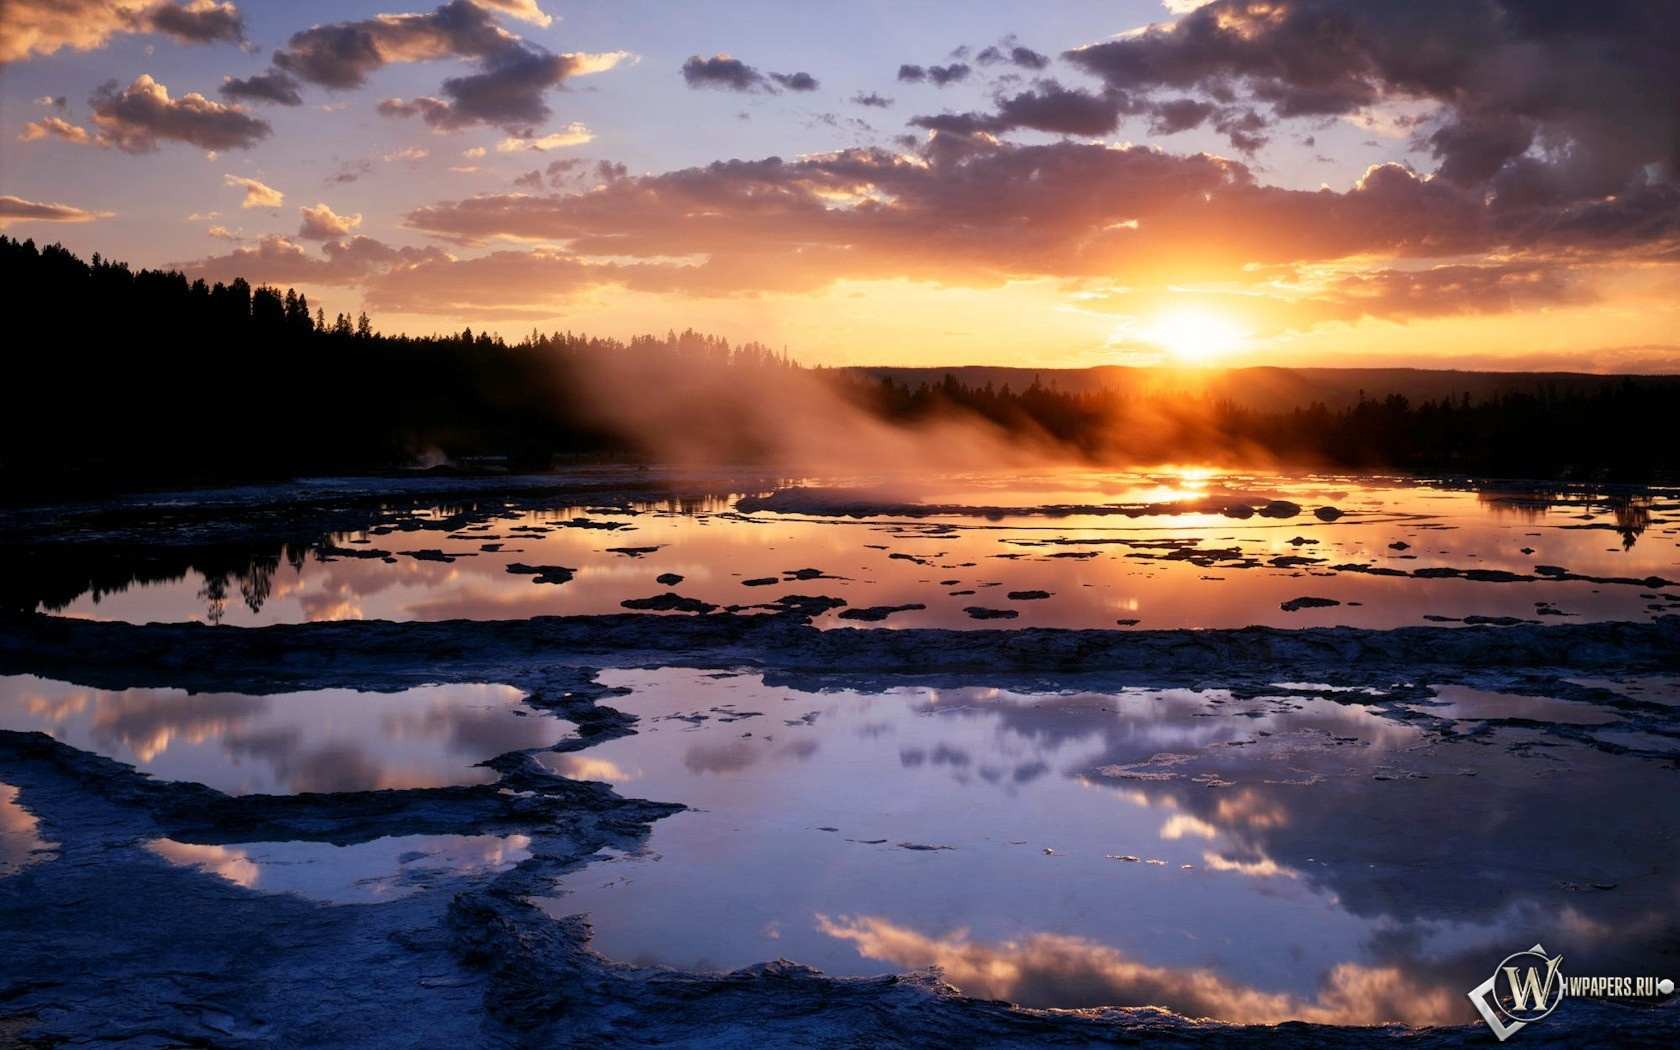 Восход над болотом 1680x1050